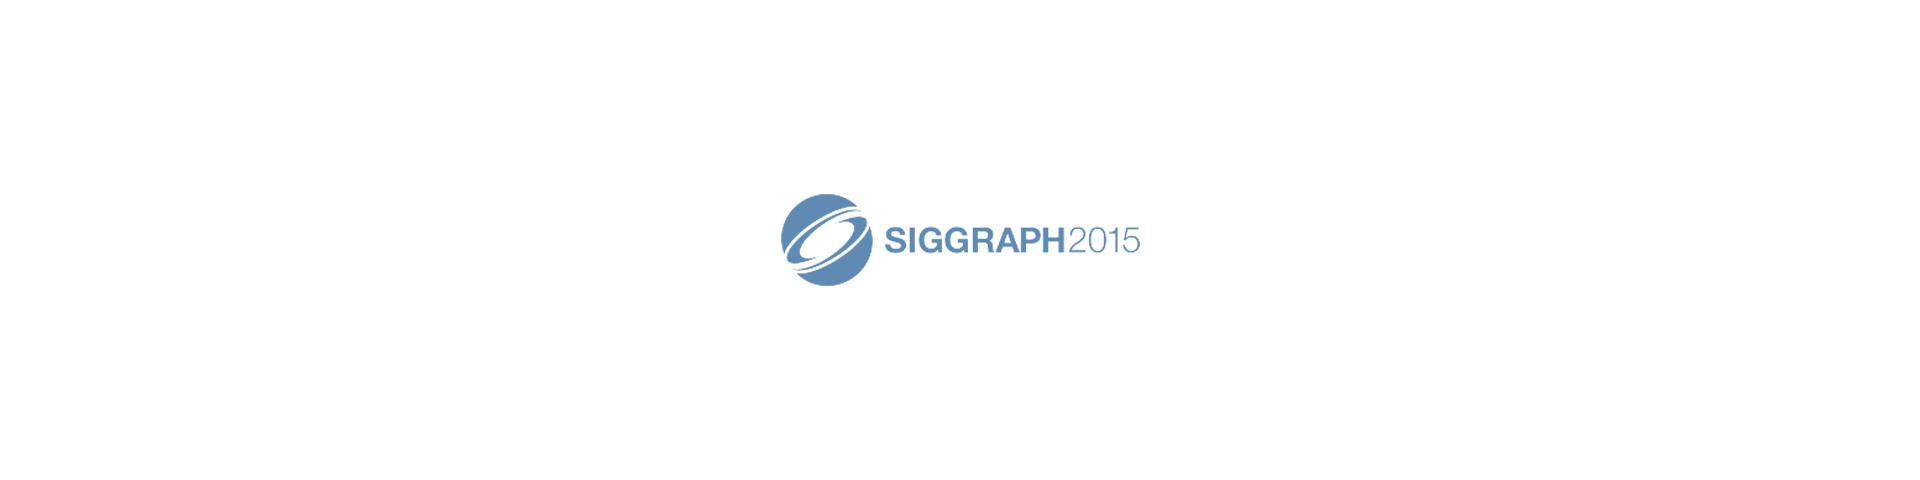 SIGGRAPH 2015 Logo